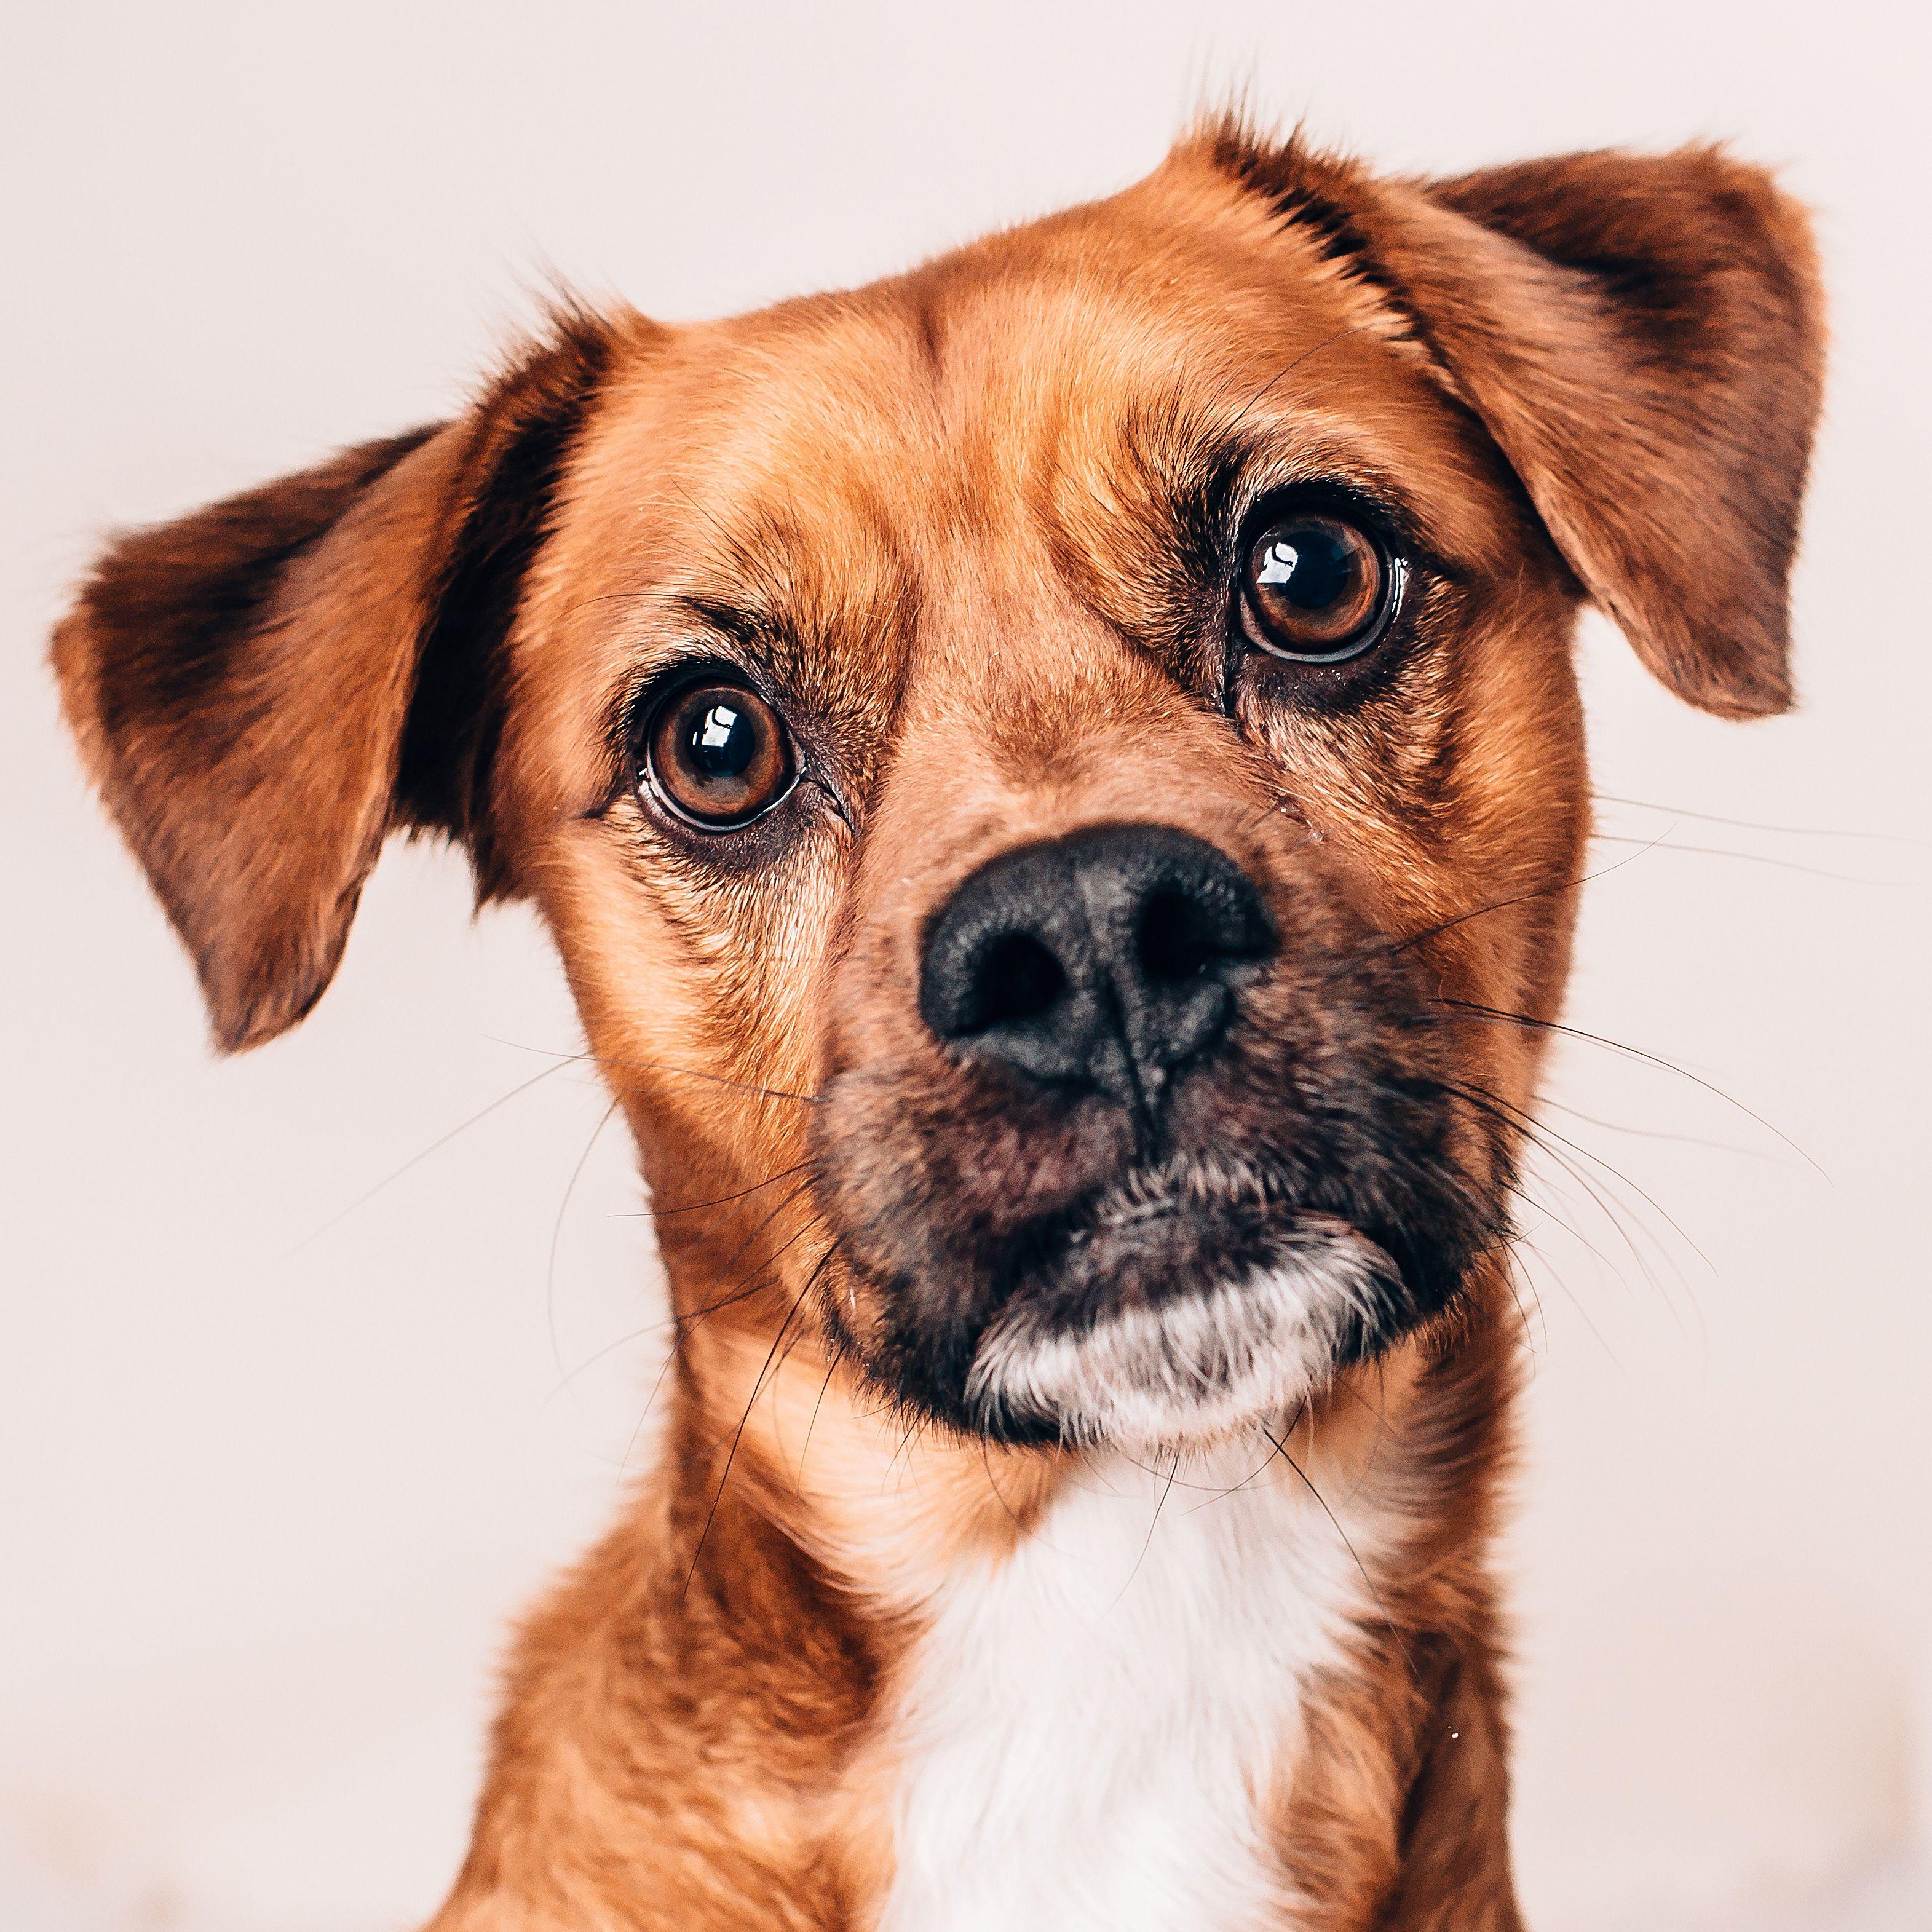 Puggle Dog For Adoption In Huntley Il Adn 781336 On Puppyfinder